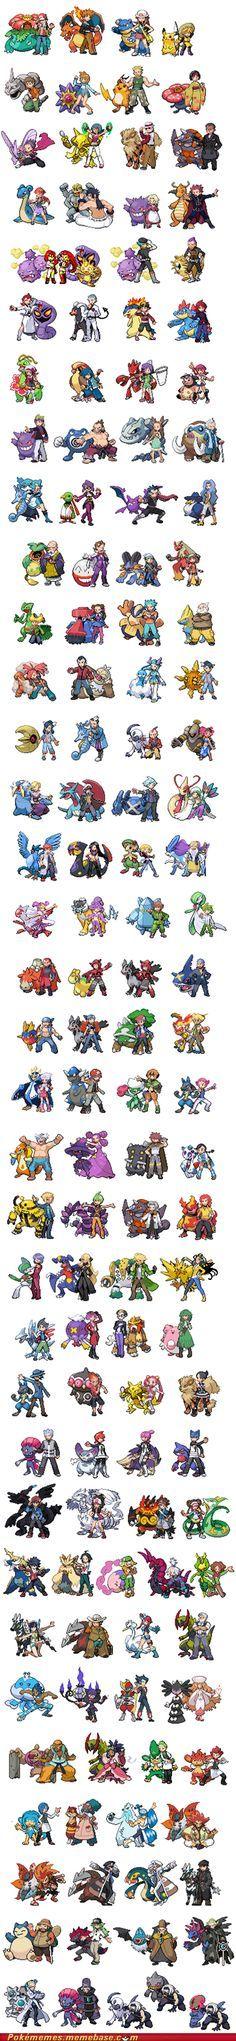 TODOS os Líderes de Ginásio de todas as versões de jogos de Pokémon!